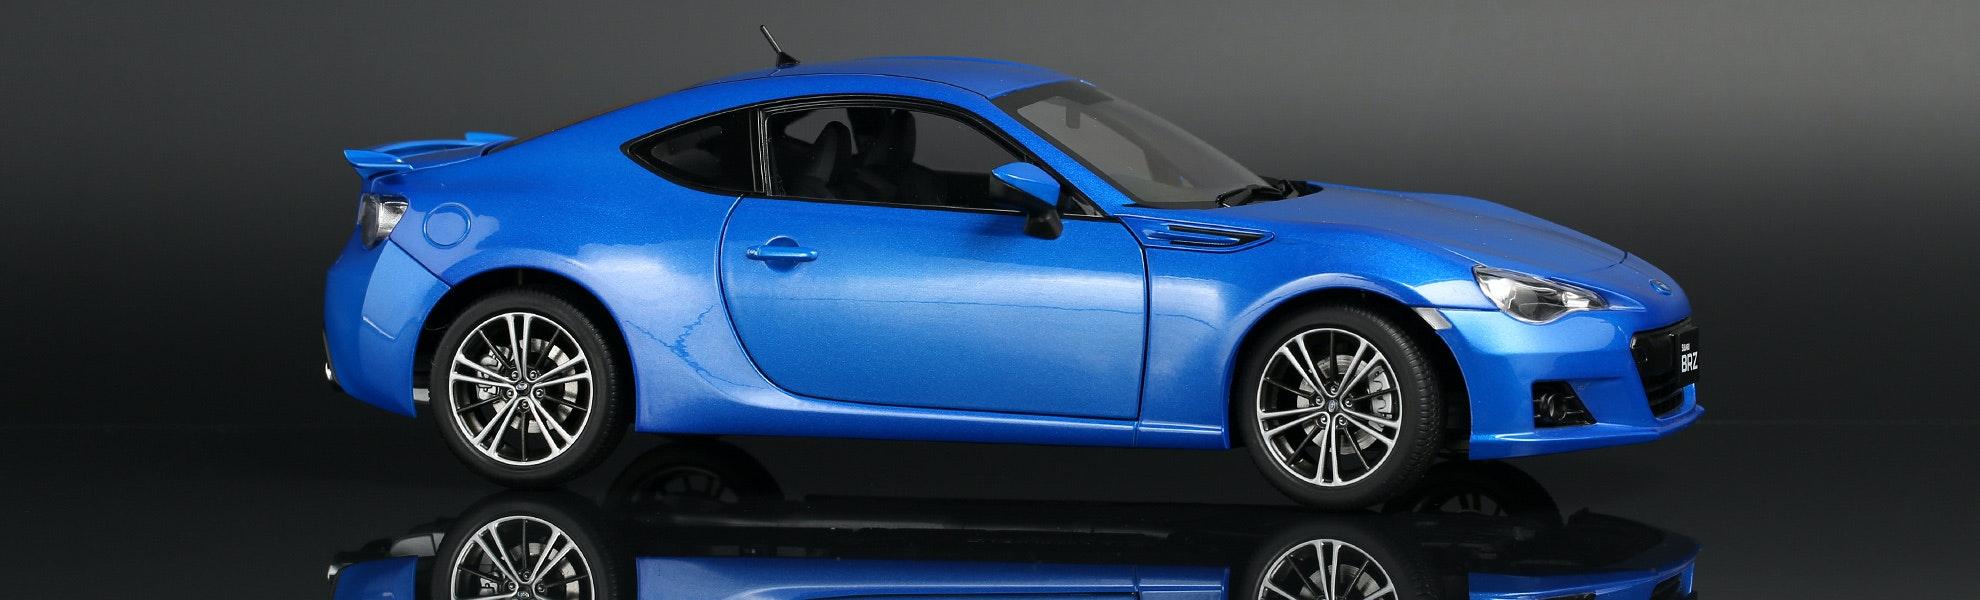 AUTOart Subaru BRZ/Scion FRS/Toyota 86 Models